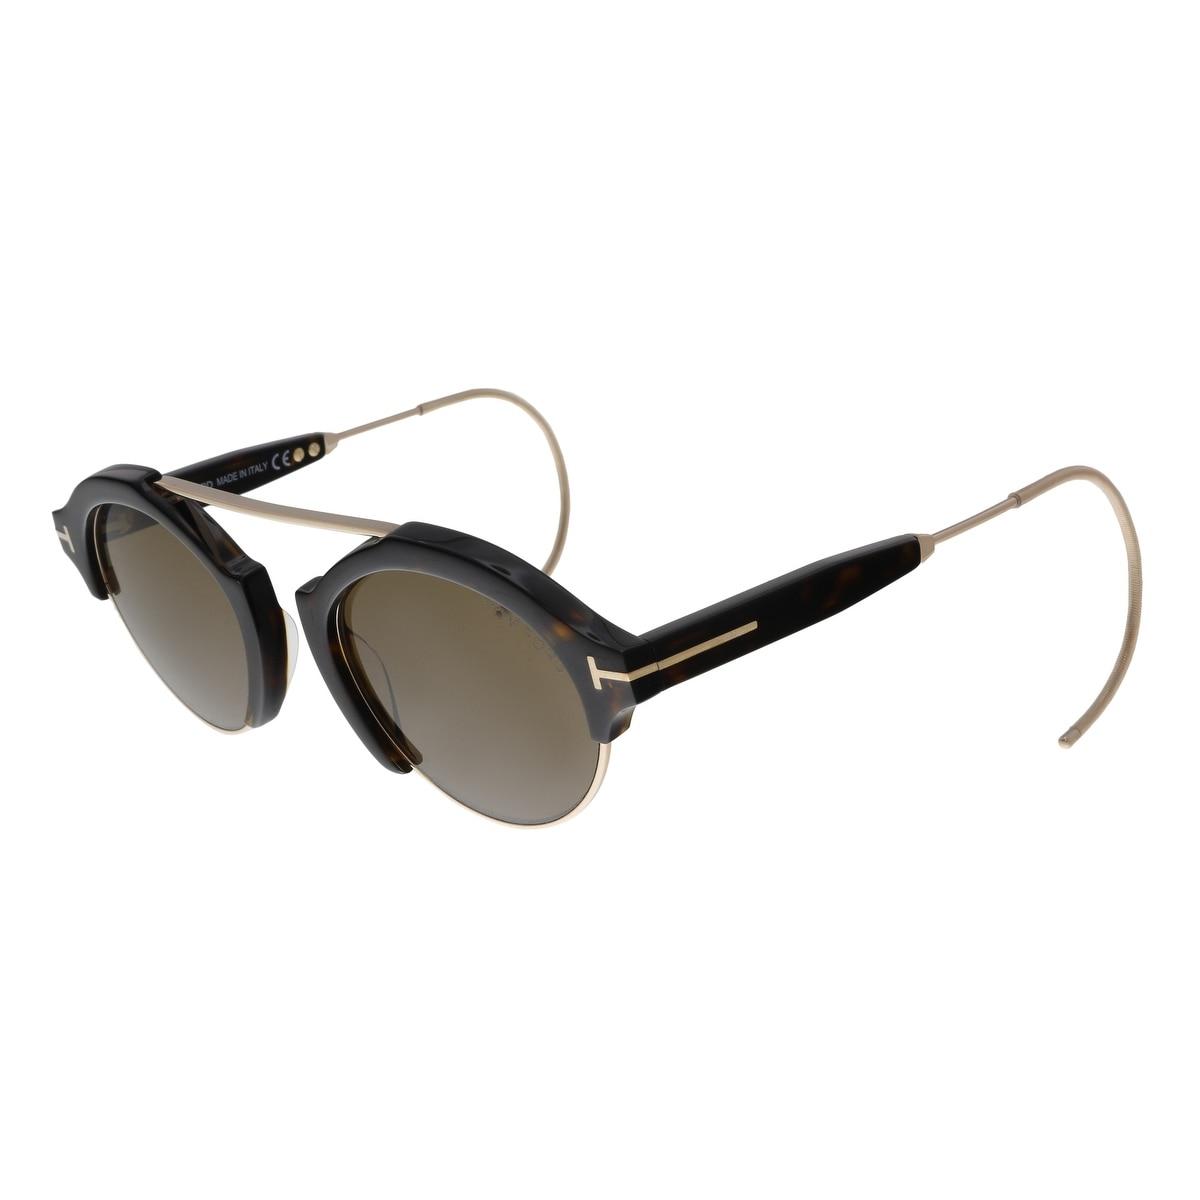 109fb2a5eea Tom Ford FT0631 52J Farrah-02 Dark Havana Gold Round Sunglasses - No Size